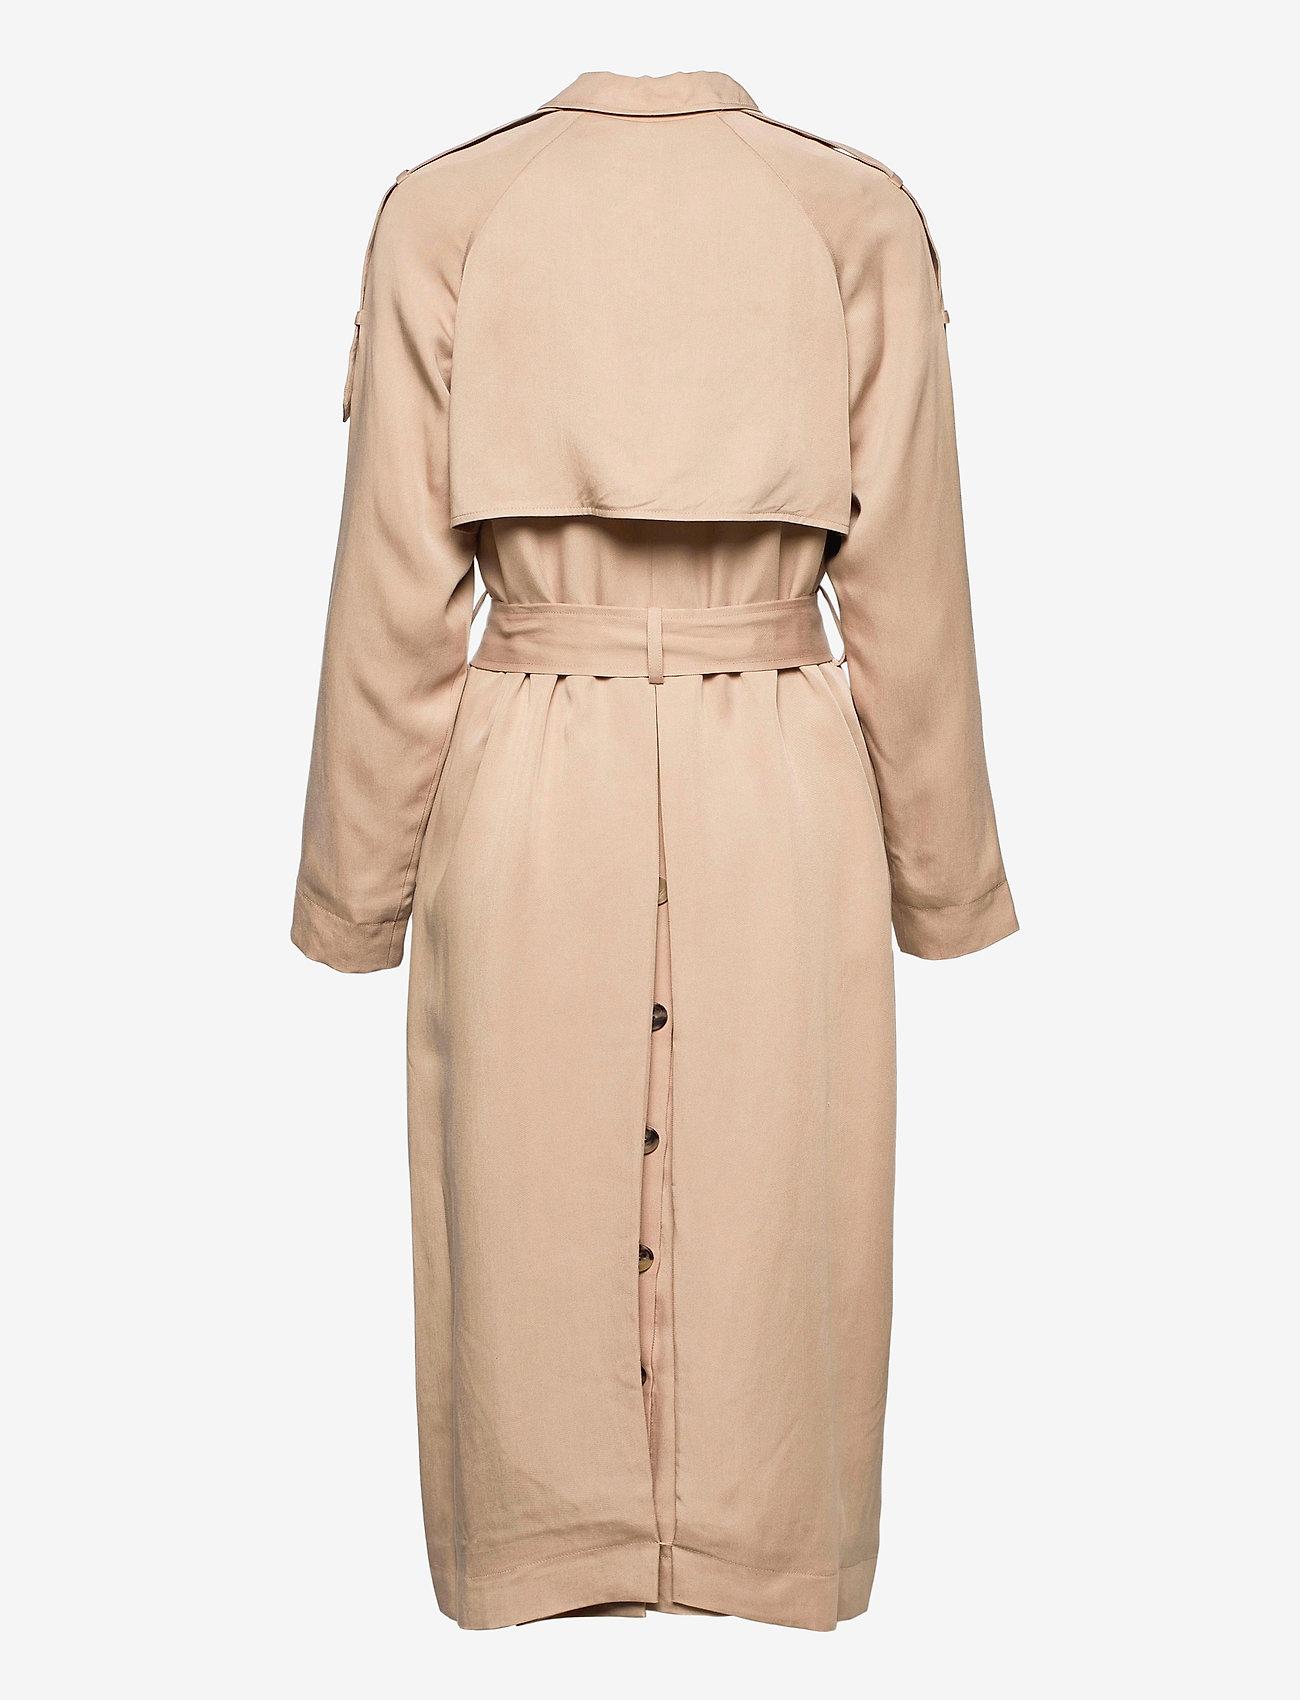 Selected Femme - SLFBRENNA TRENCHCOAT - trenchcoats - nomad - 1